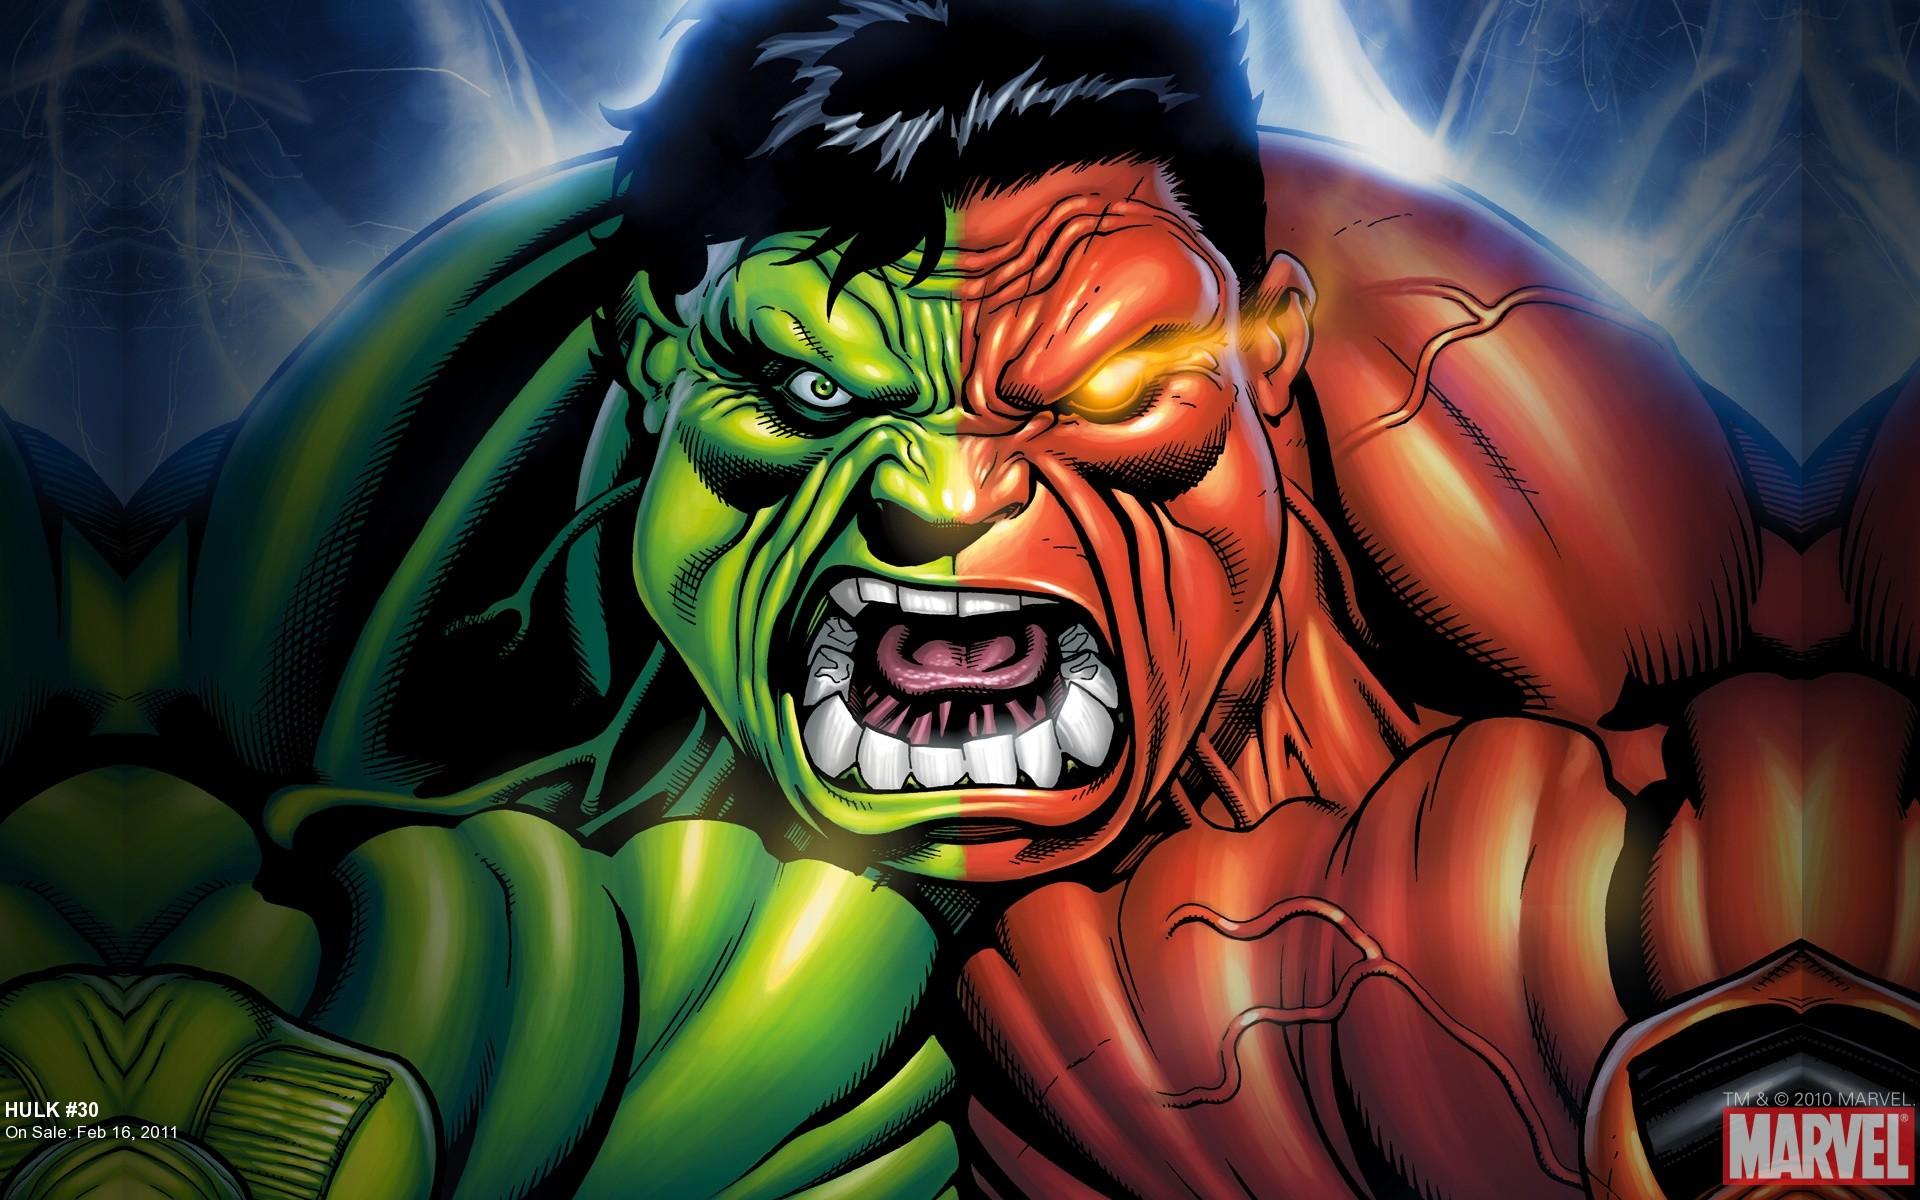 Cool Wallpaper Marvel The Incredible Hulk - wallpaper_widescreen  Gallery_13534.jpg